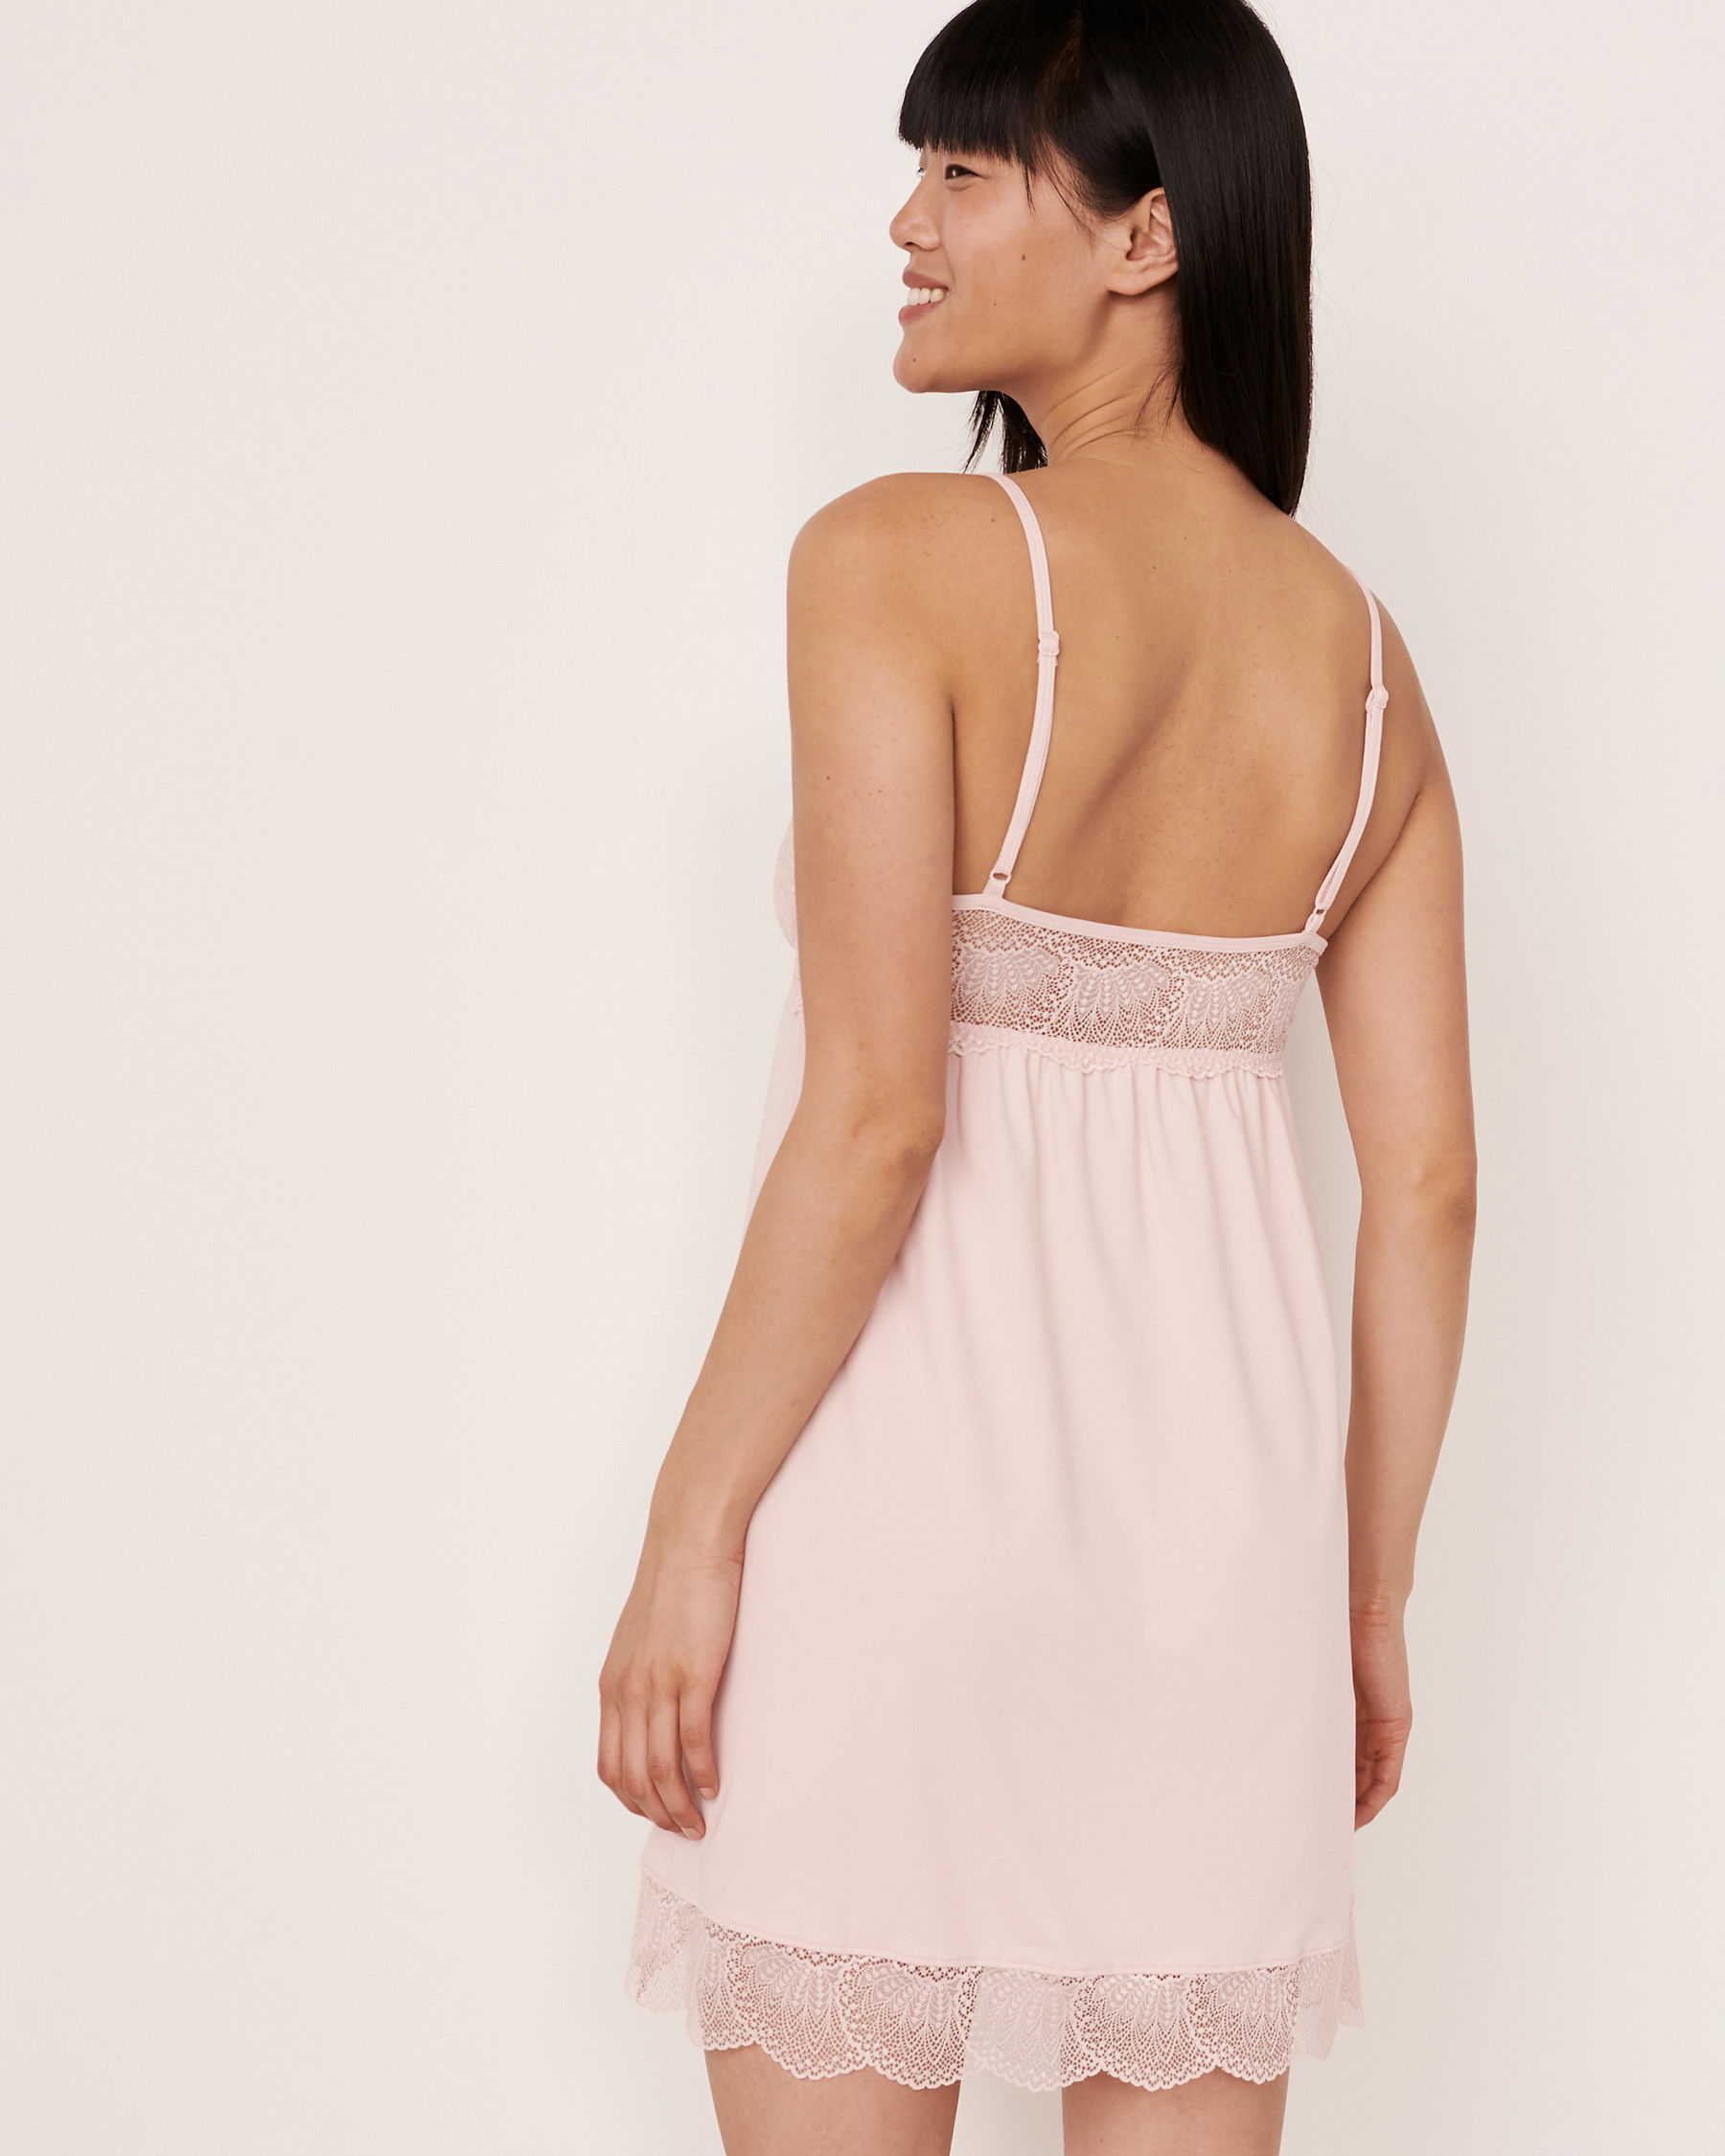 LA VIE EN ROSE Lace Trim Thin Straps Nightie Light pink 40500060 - View2